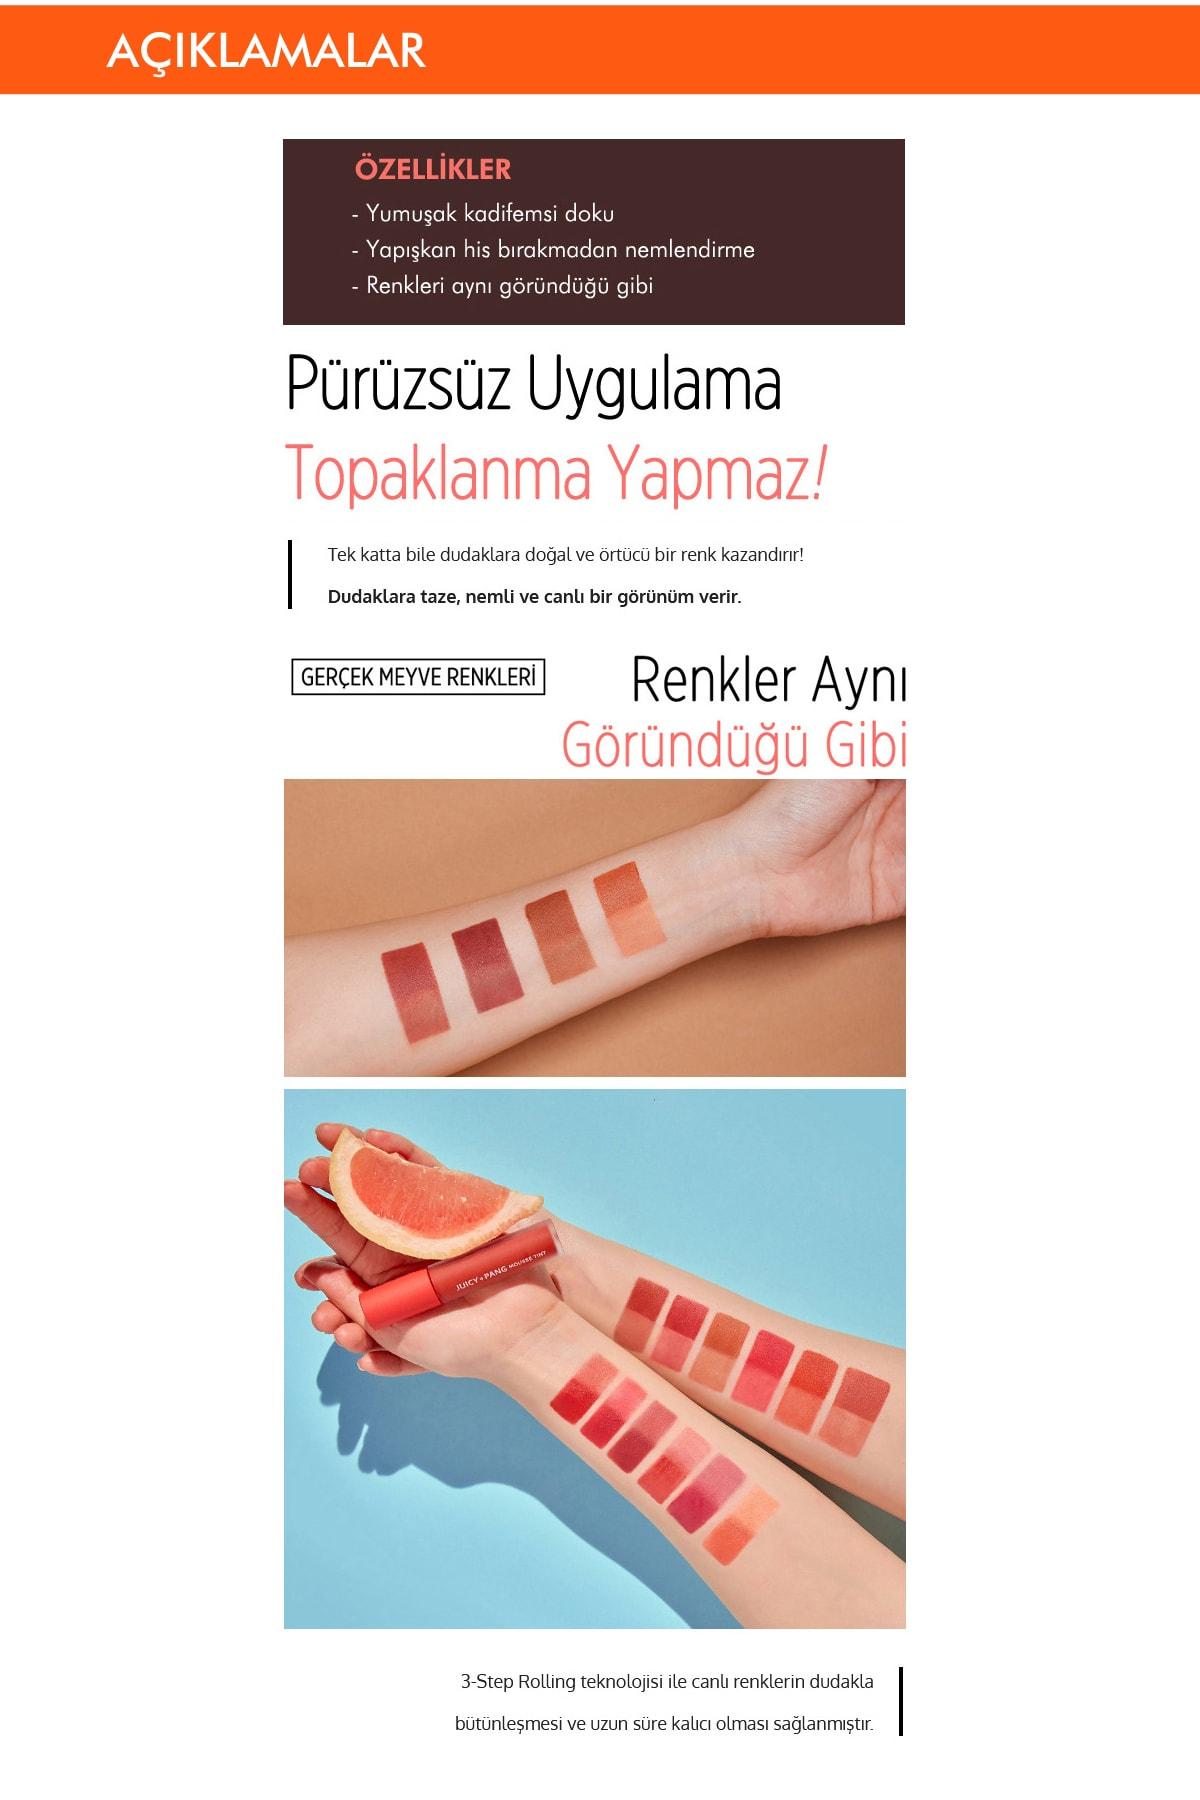 Missha Pürüzsüz Görünüm Sunan Kalıcı Köpük Tint  Ruj APIEU Juicy Pang Mousse Tint (CR05) 3